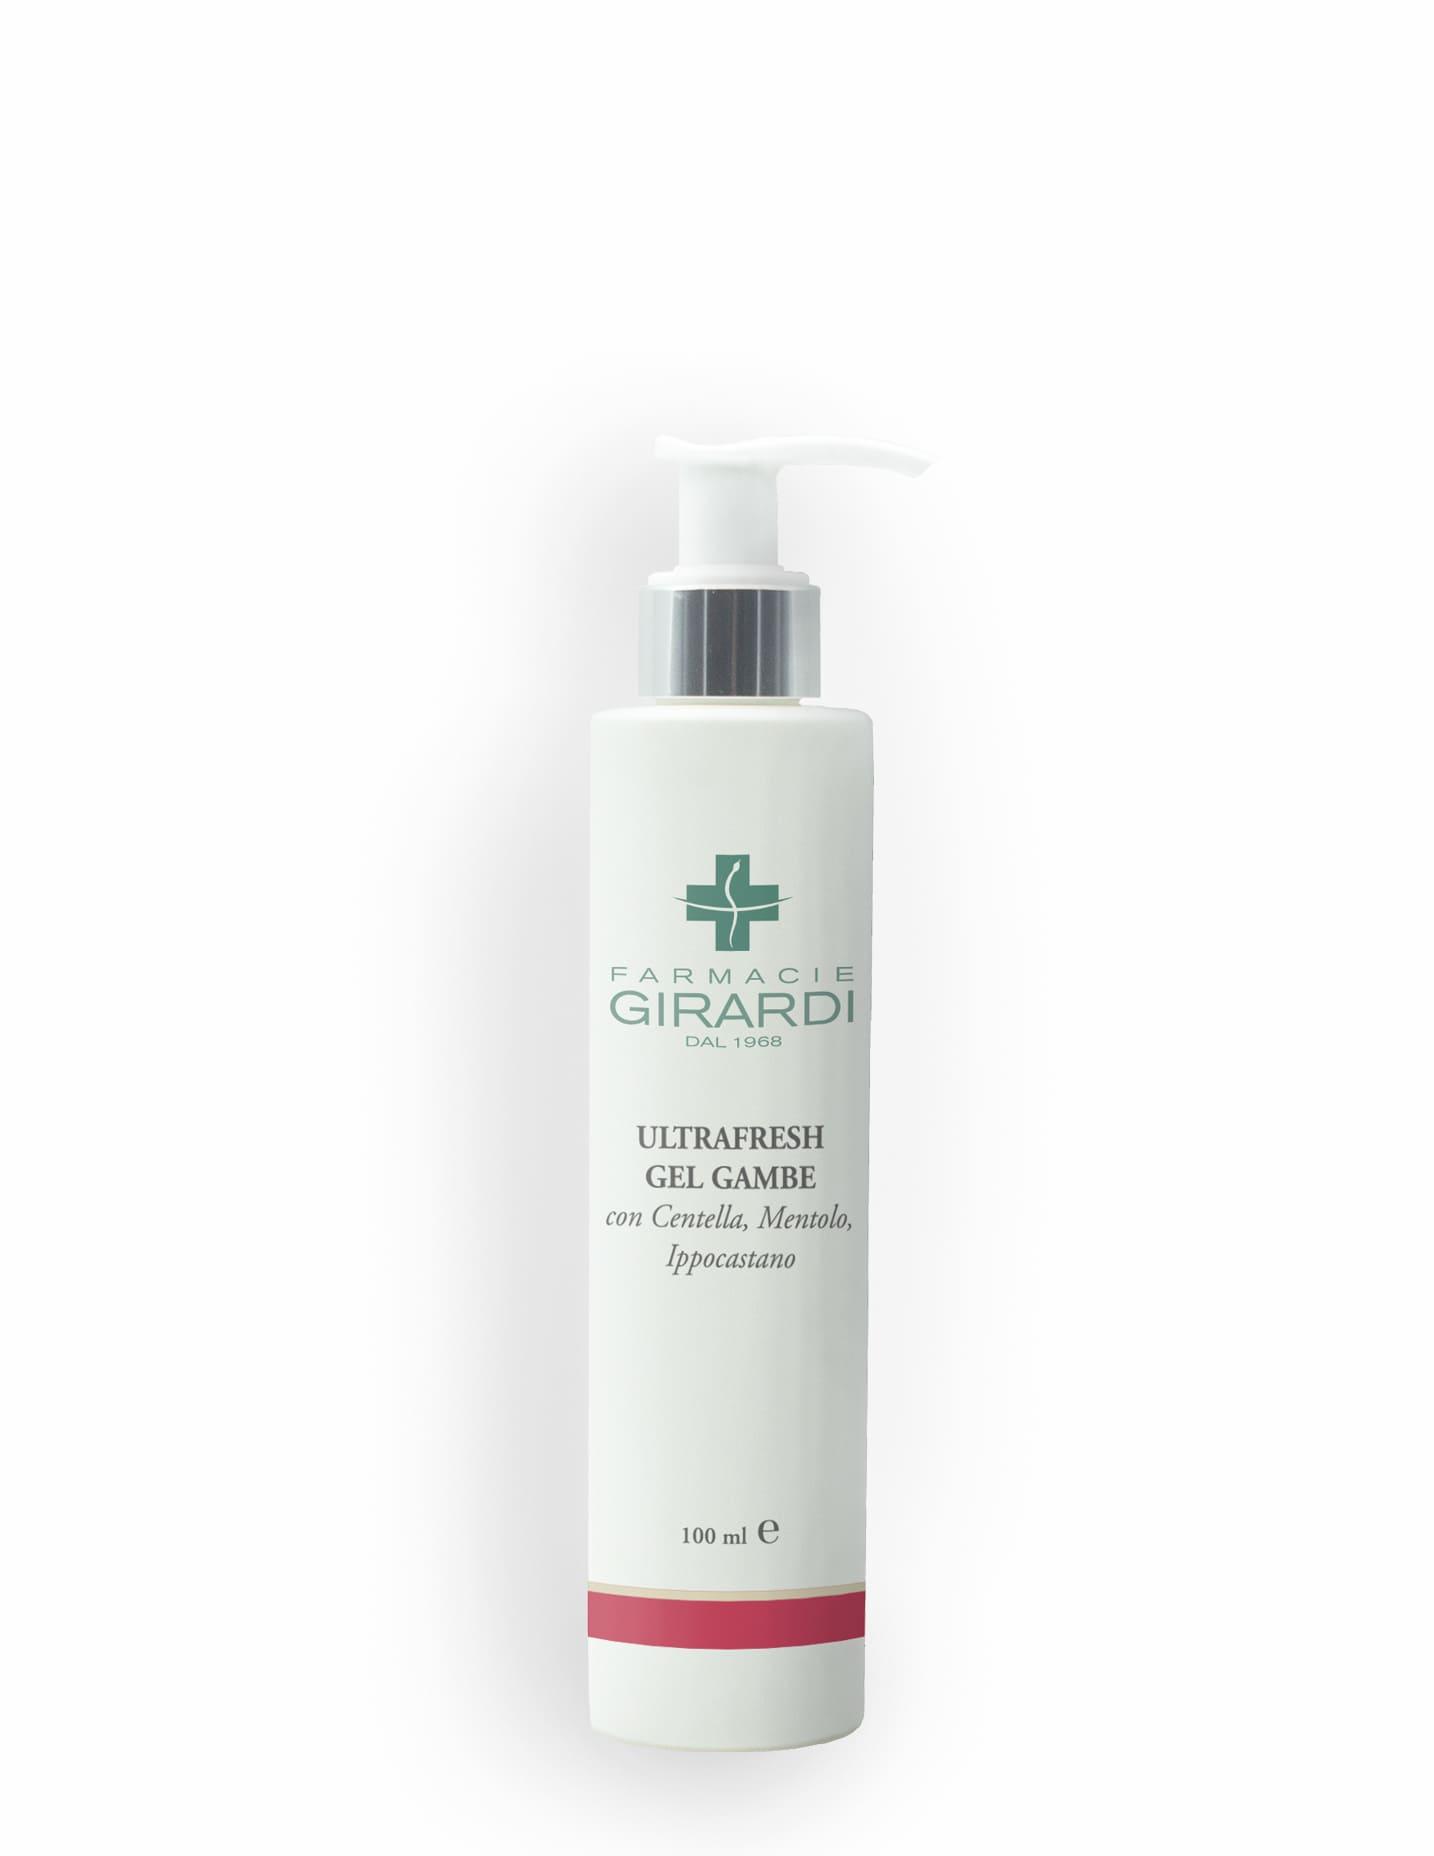 ULTRAFRESH GEL GAMBE - Crema gel rinfrescante Farmacia Girardi 100 ml - Farmalke.it